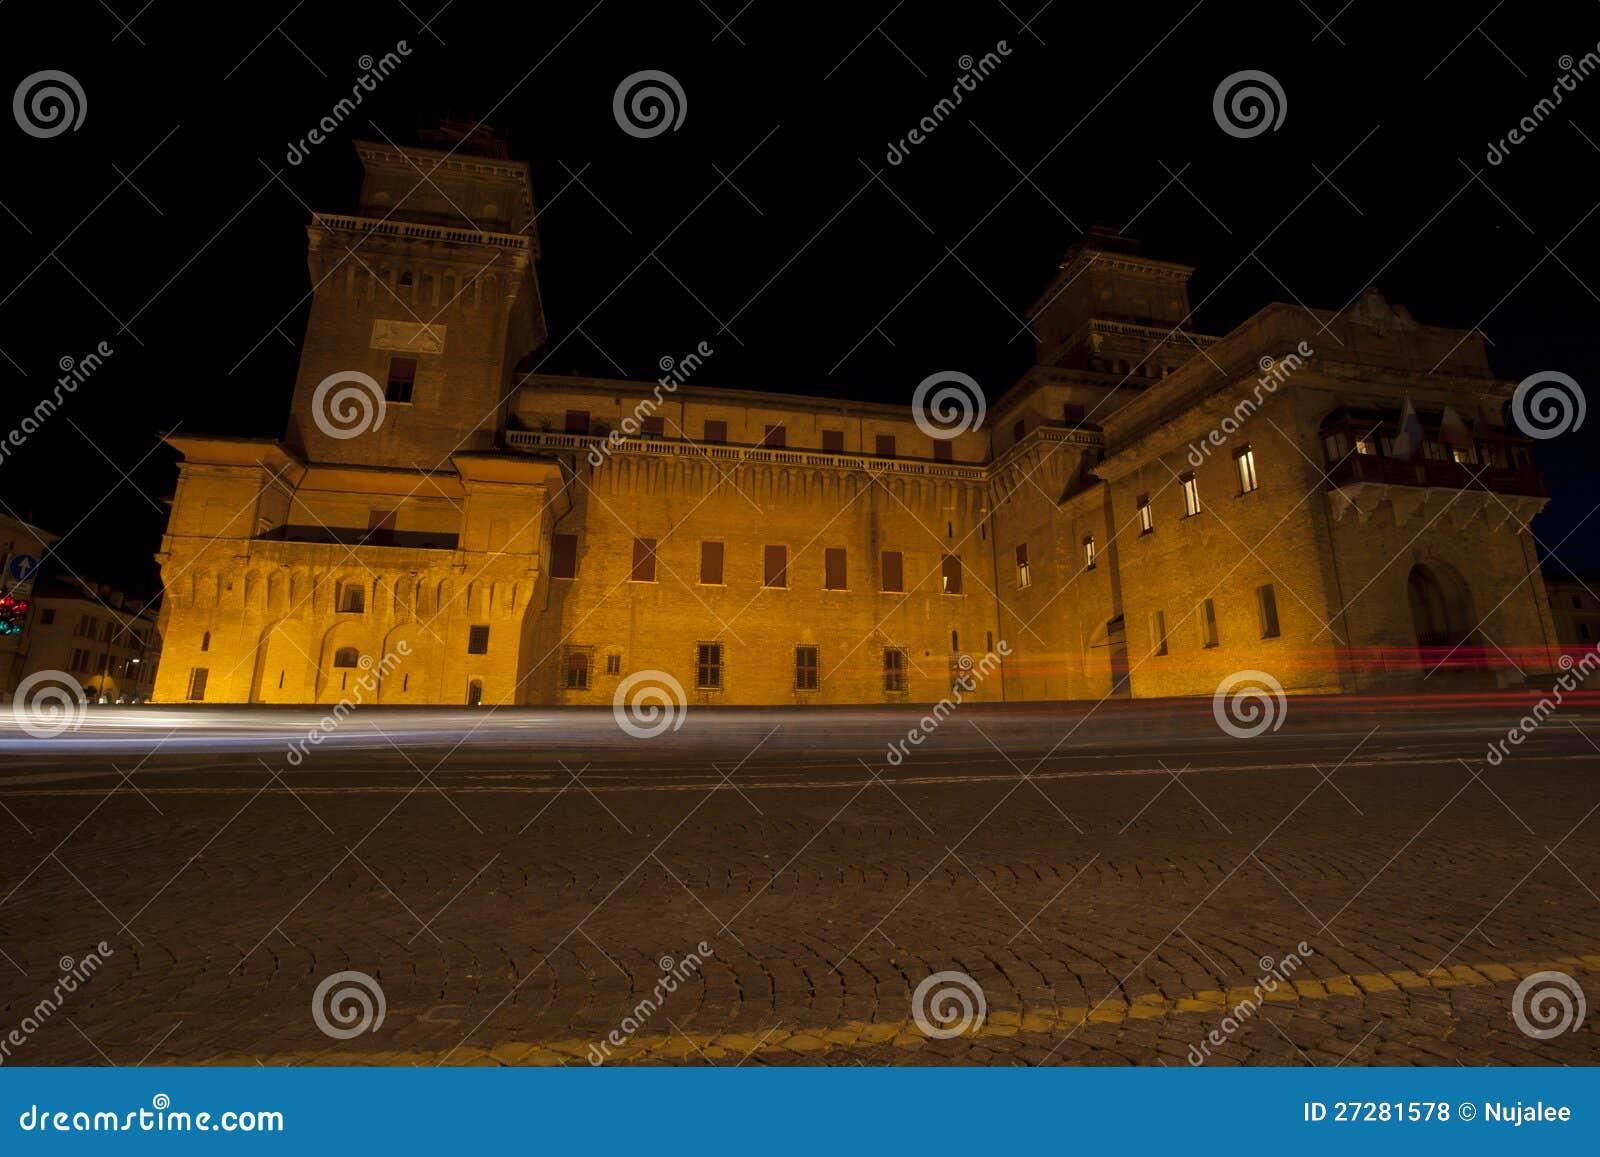 Castello Estense slott i Ferrara, Italien